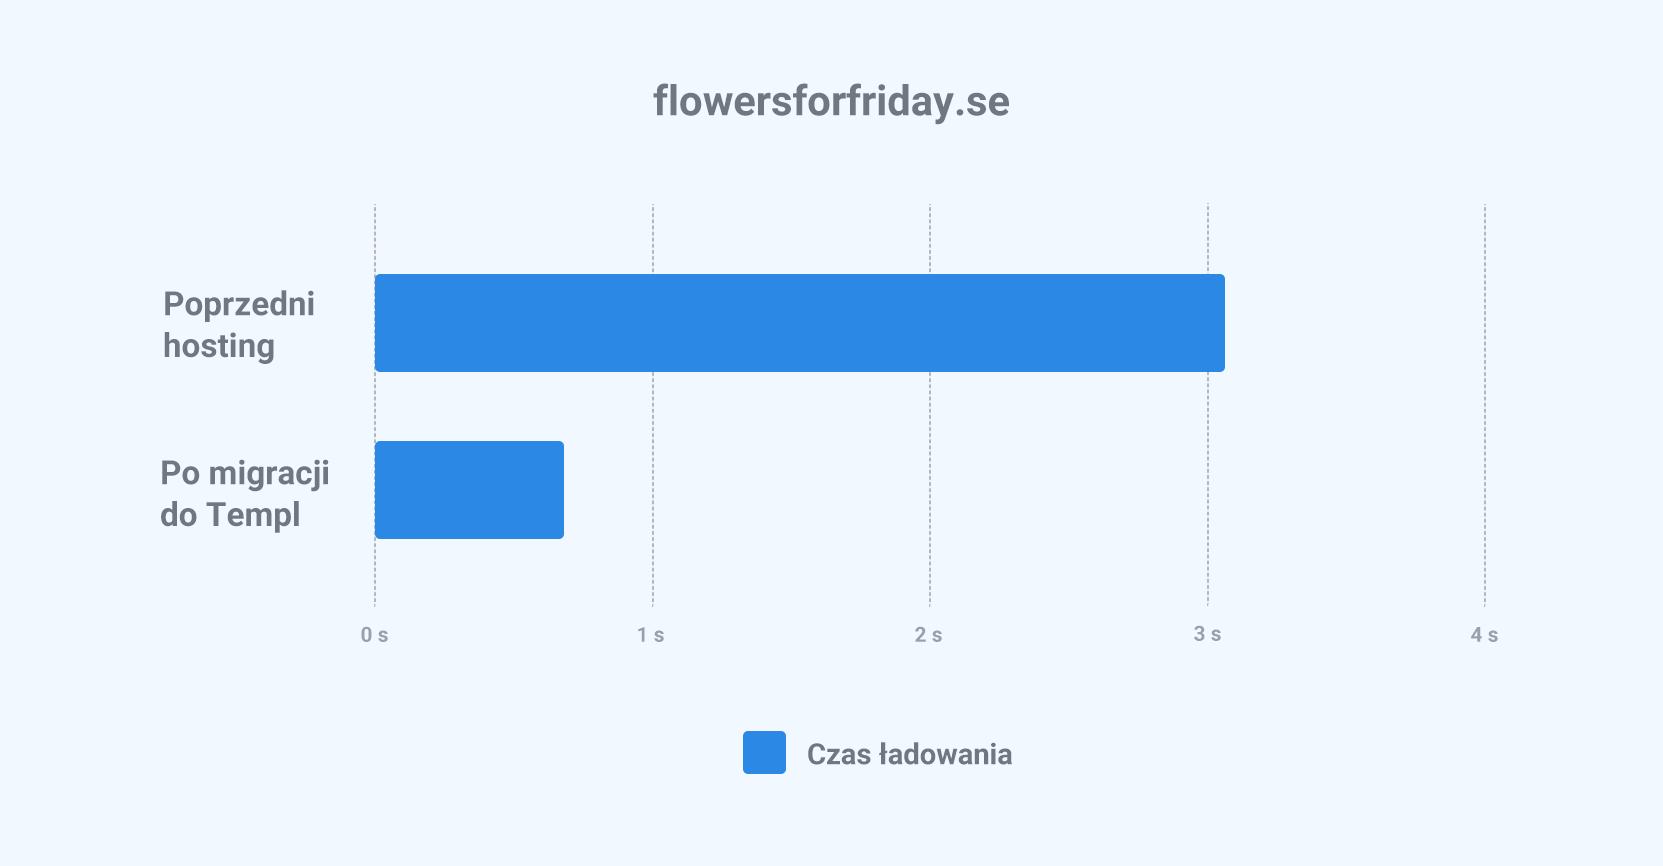 flowers-for-friday-website